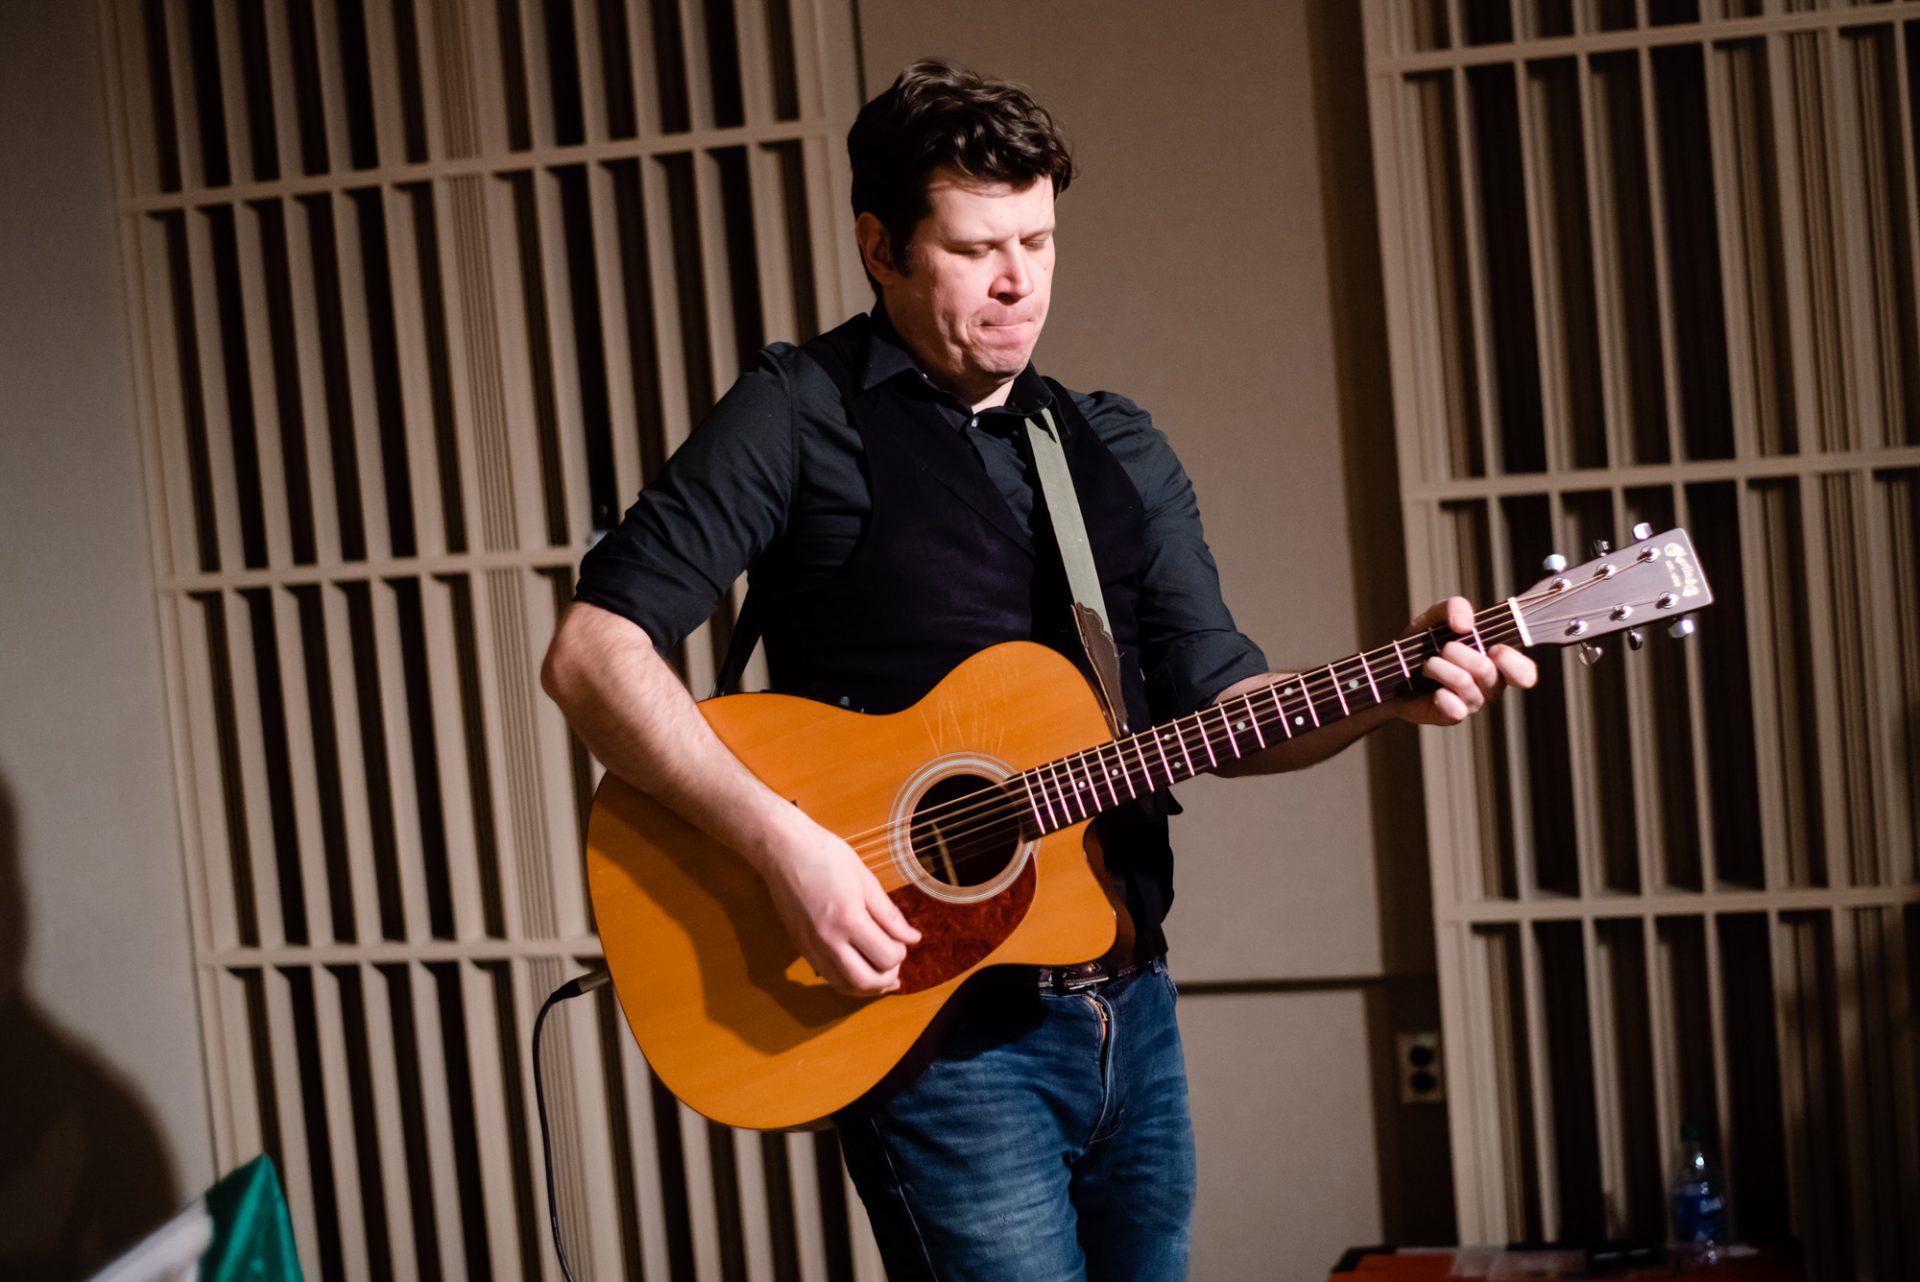 Guitarist James Lipka